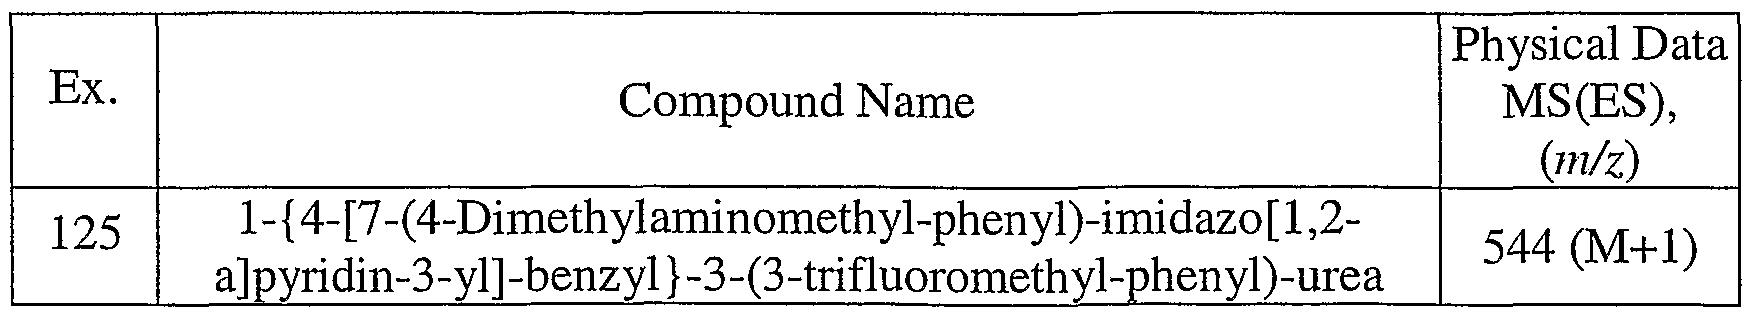 WO2006091671A1 - Imidazo (1, 2-a) pyridine compounds as vegf-r2